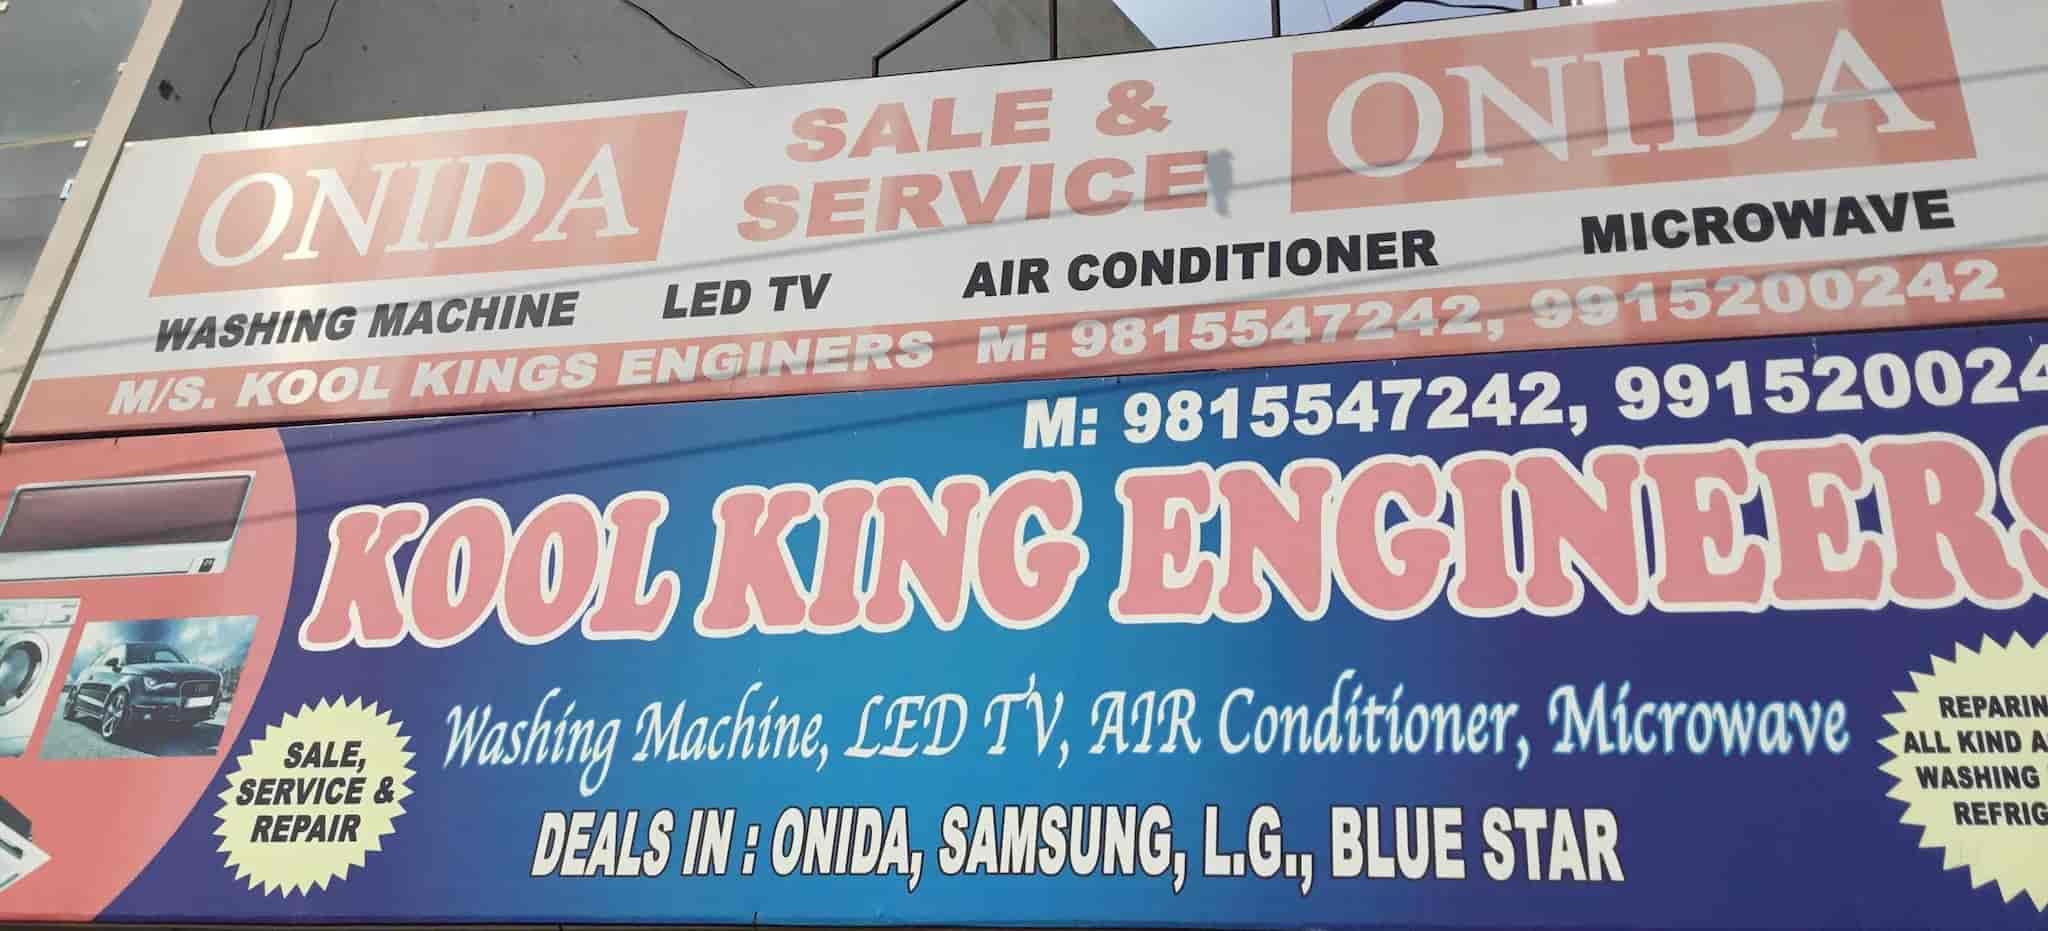 Kool King Industries, Rajpura HO - Car AC Repair & Services